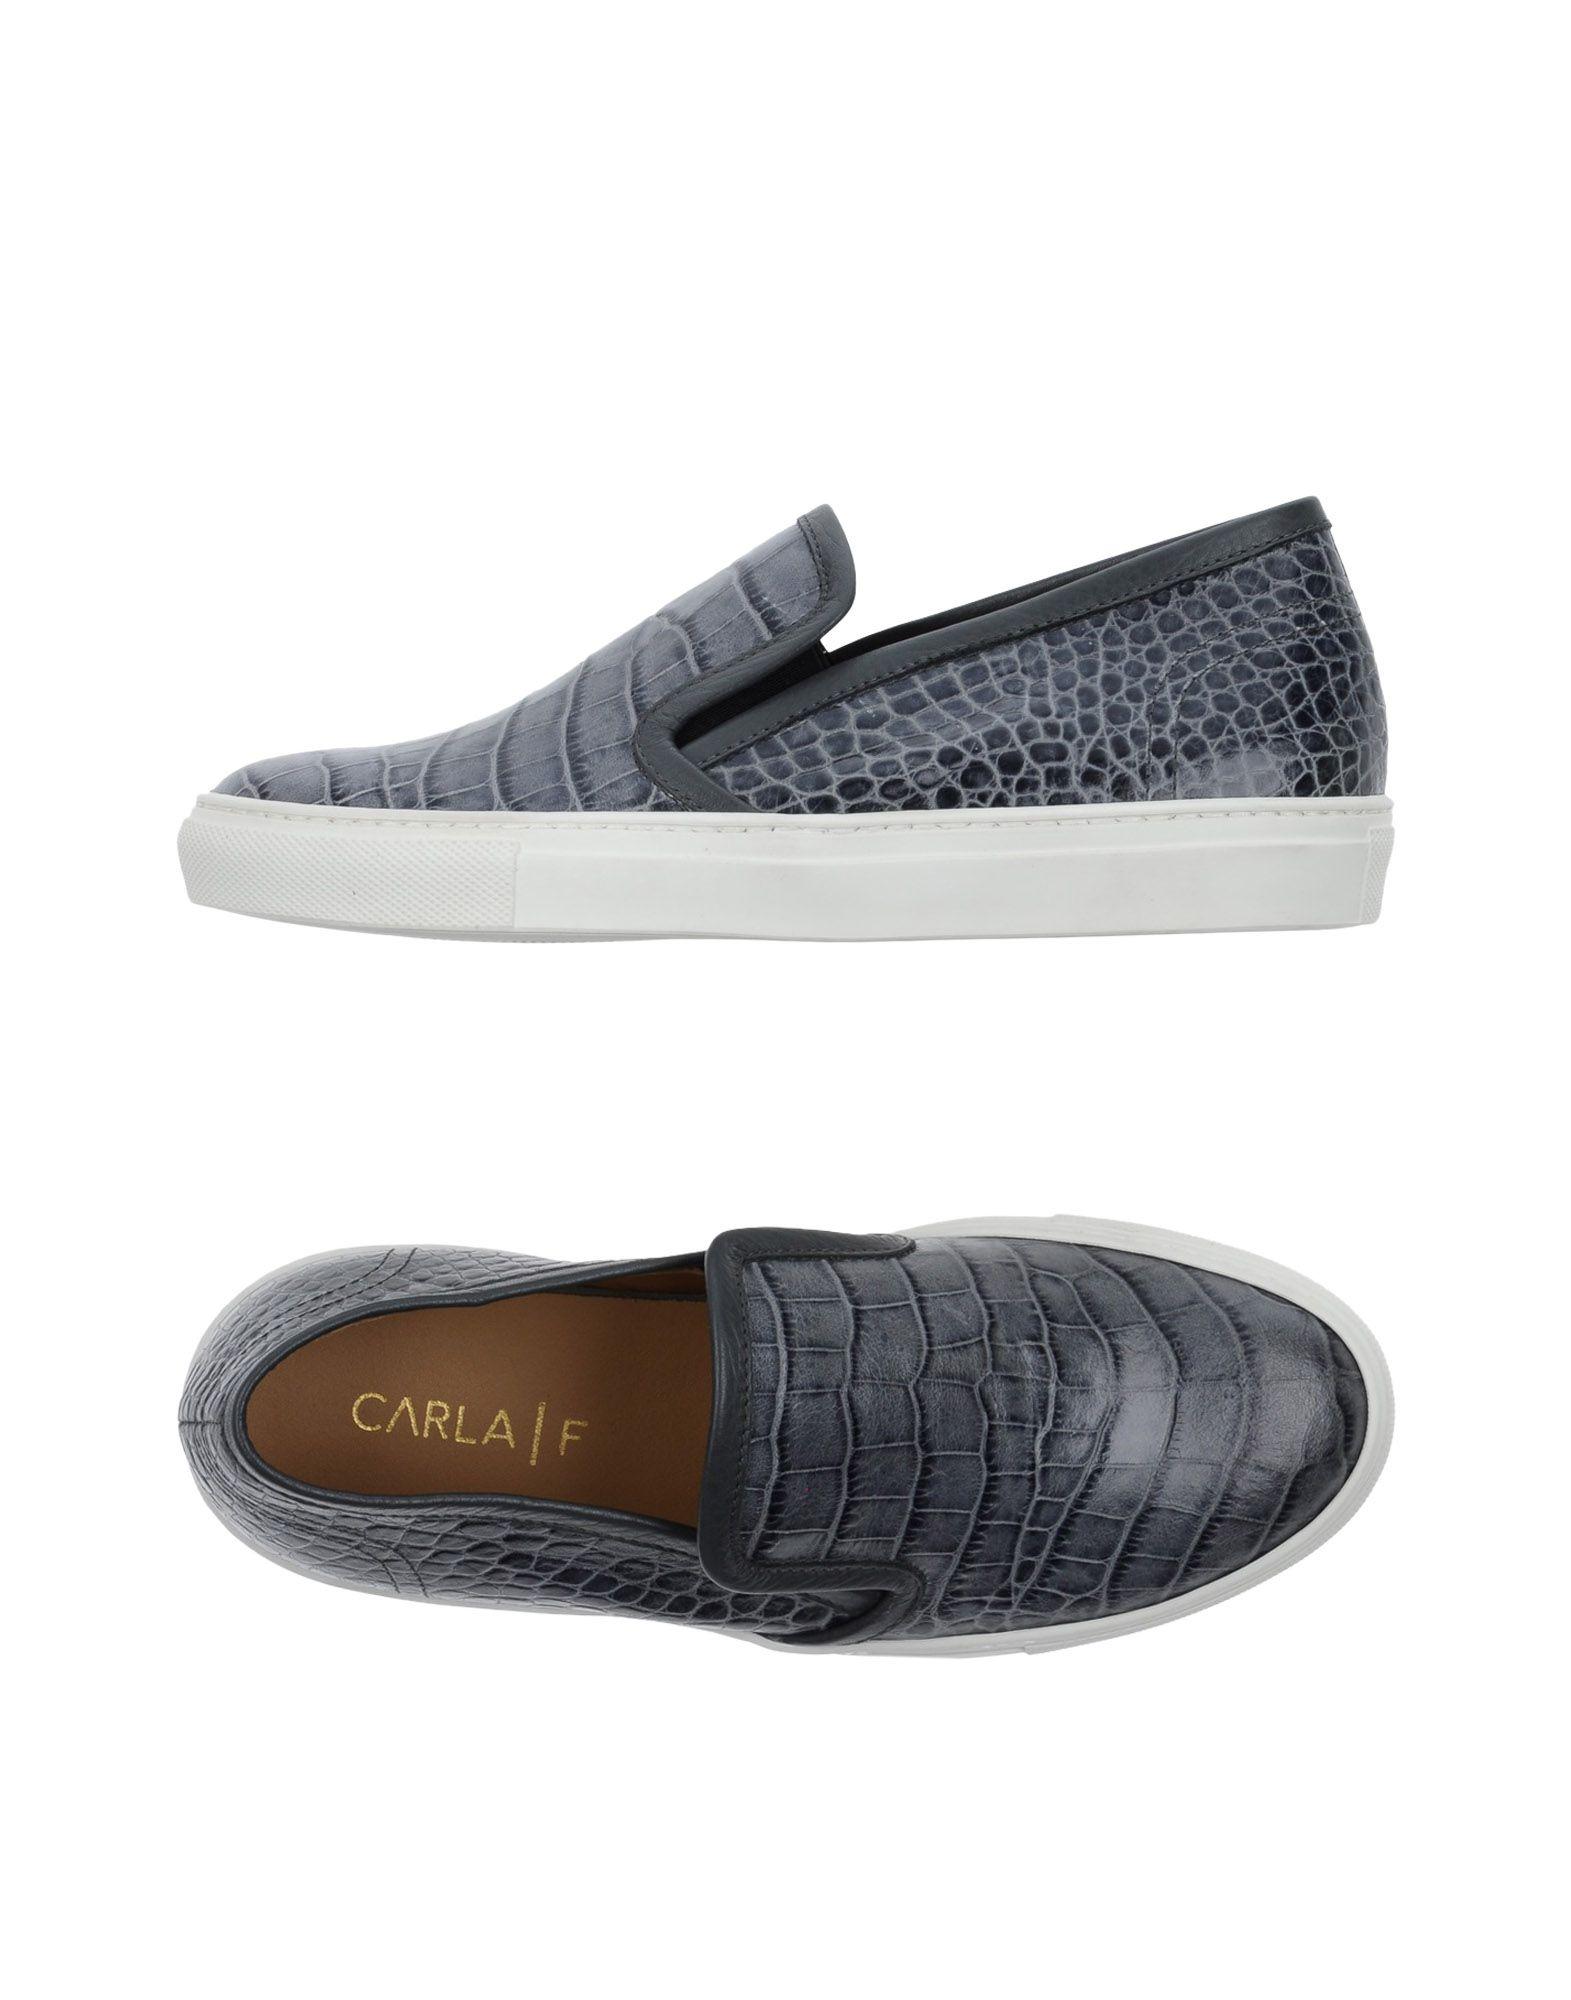 Carla F Sneakers Damen  11359856TW Gute Qualität beliebte Schuhe